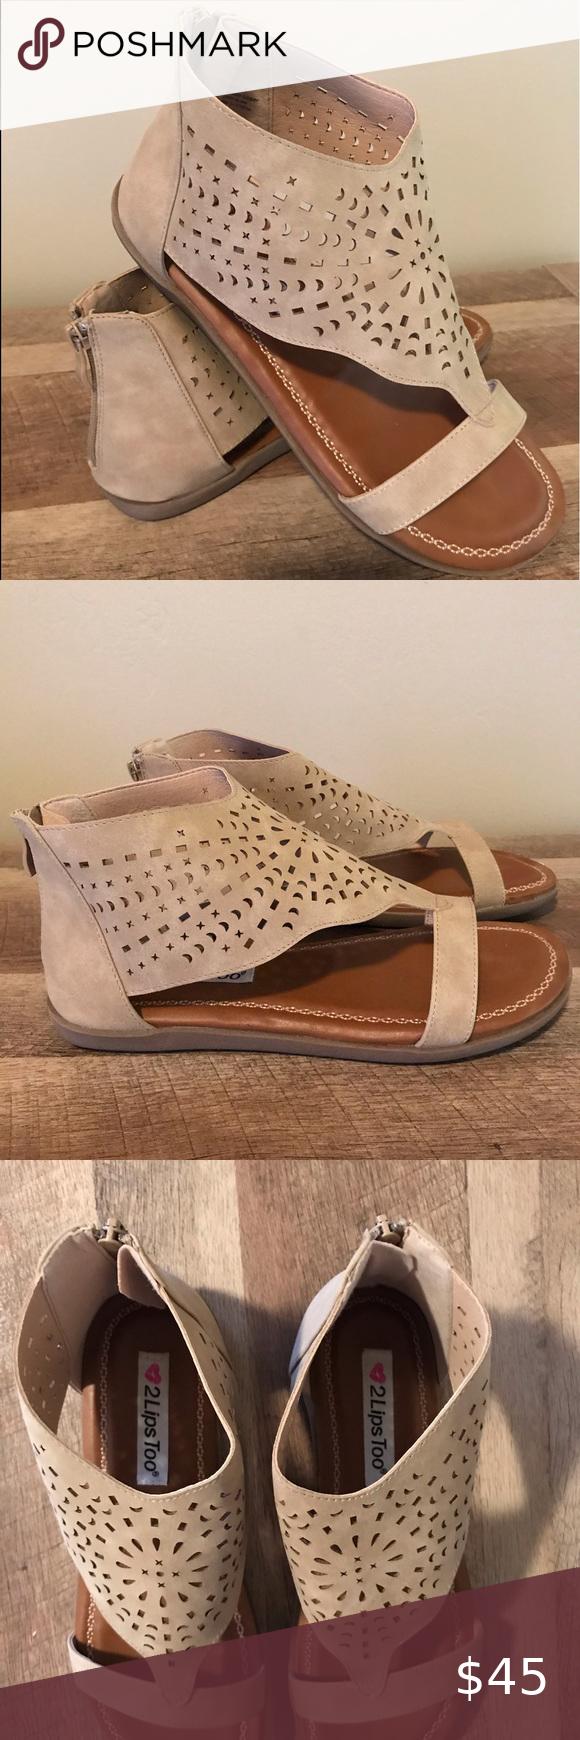 2 Lips Too Sandal Cutout Sandal Sandals Shoes [ 1740 x 580 Pixel ]